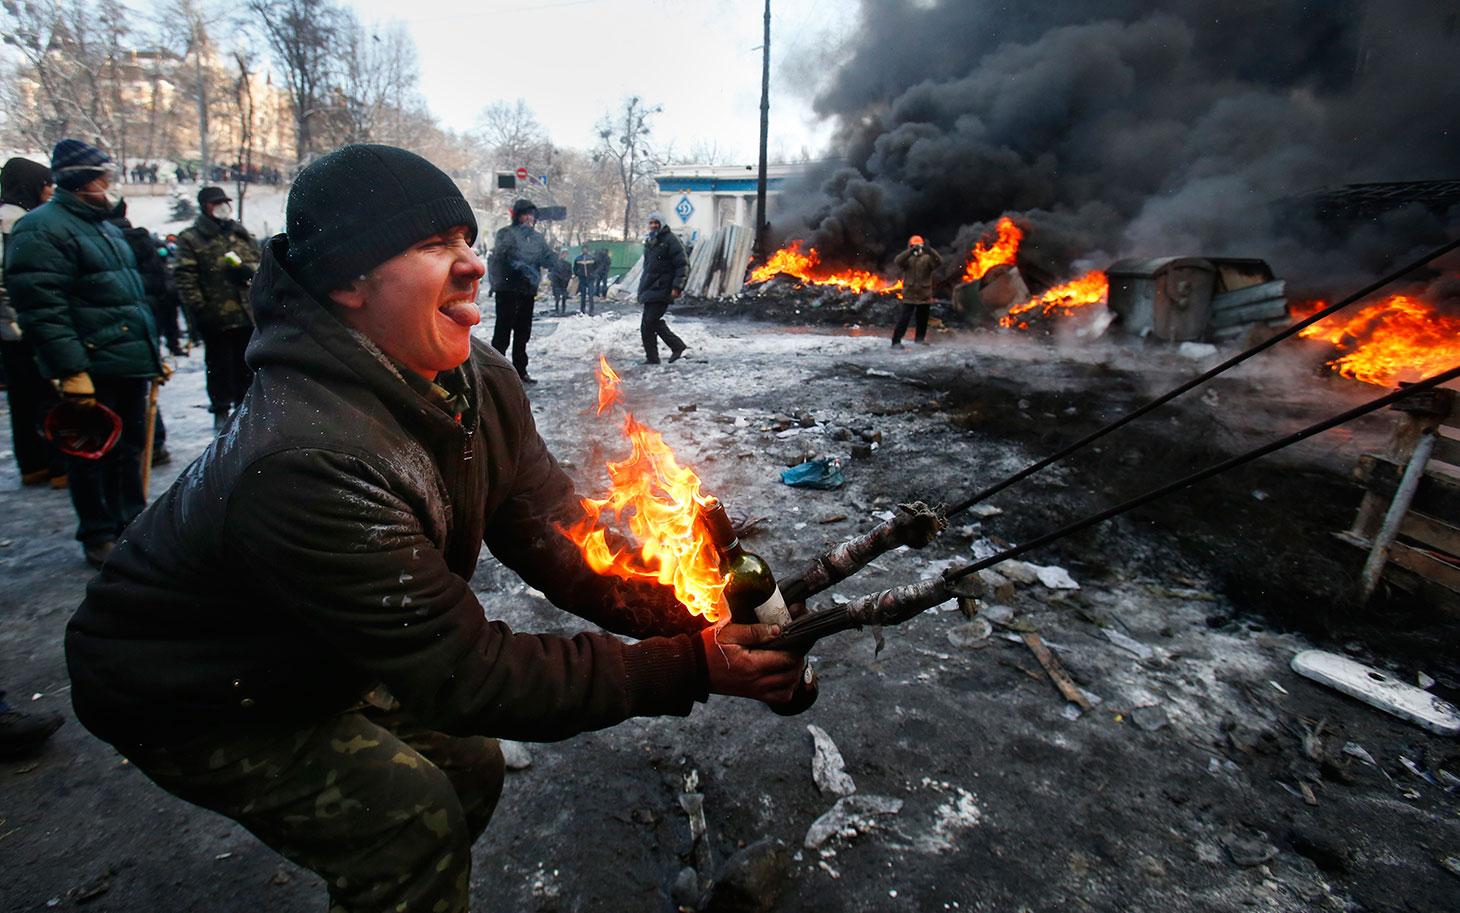 ukraine_protest_012314.jpg